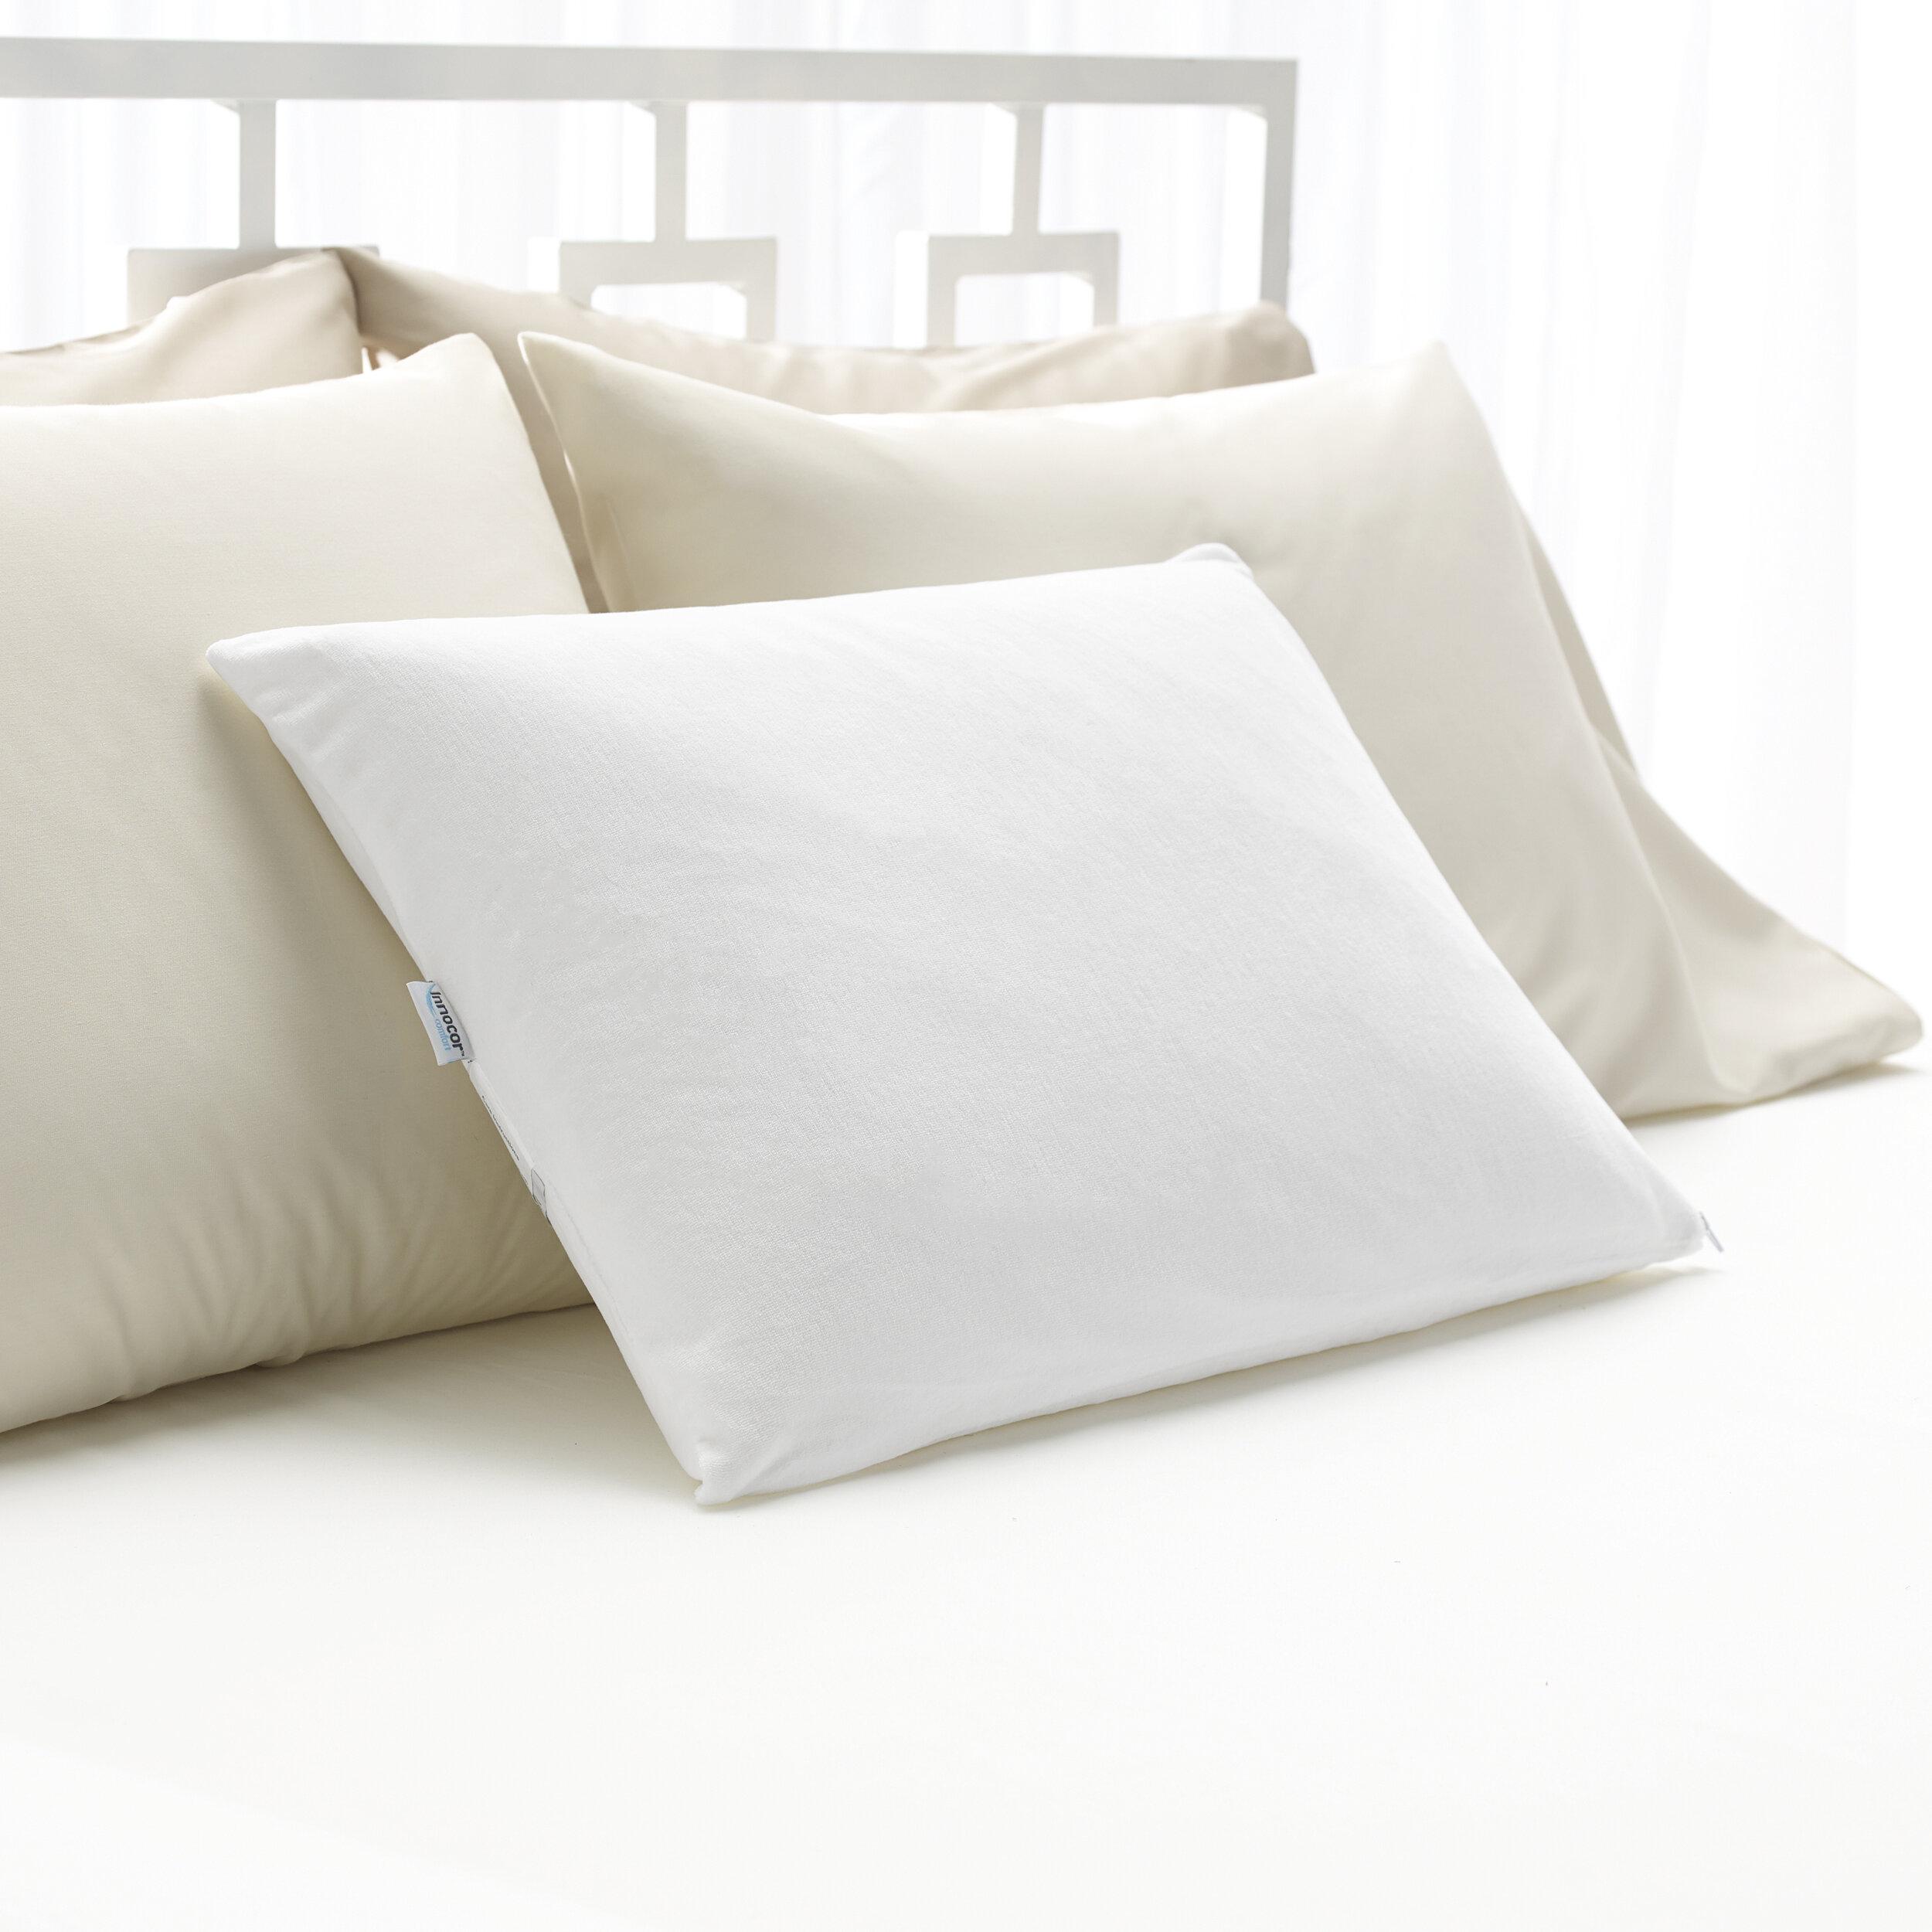 Sleep Innovations Queen Memory Foam Classic Pillow by Sleep Innovations